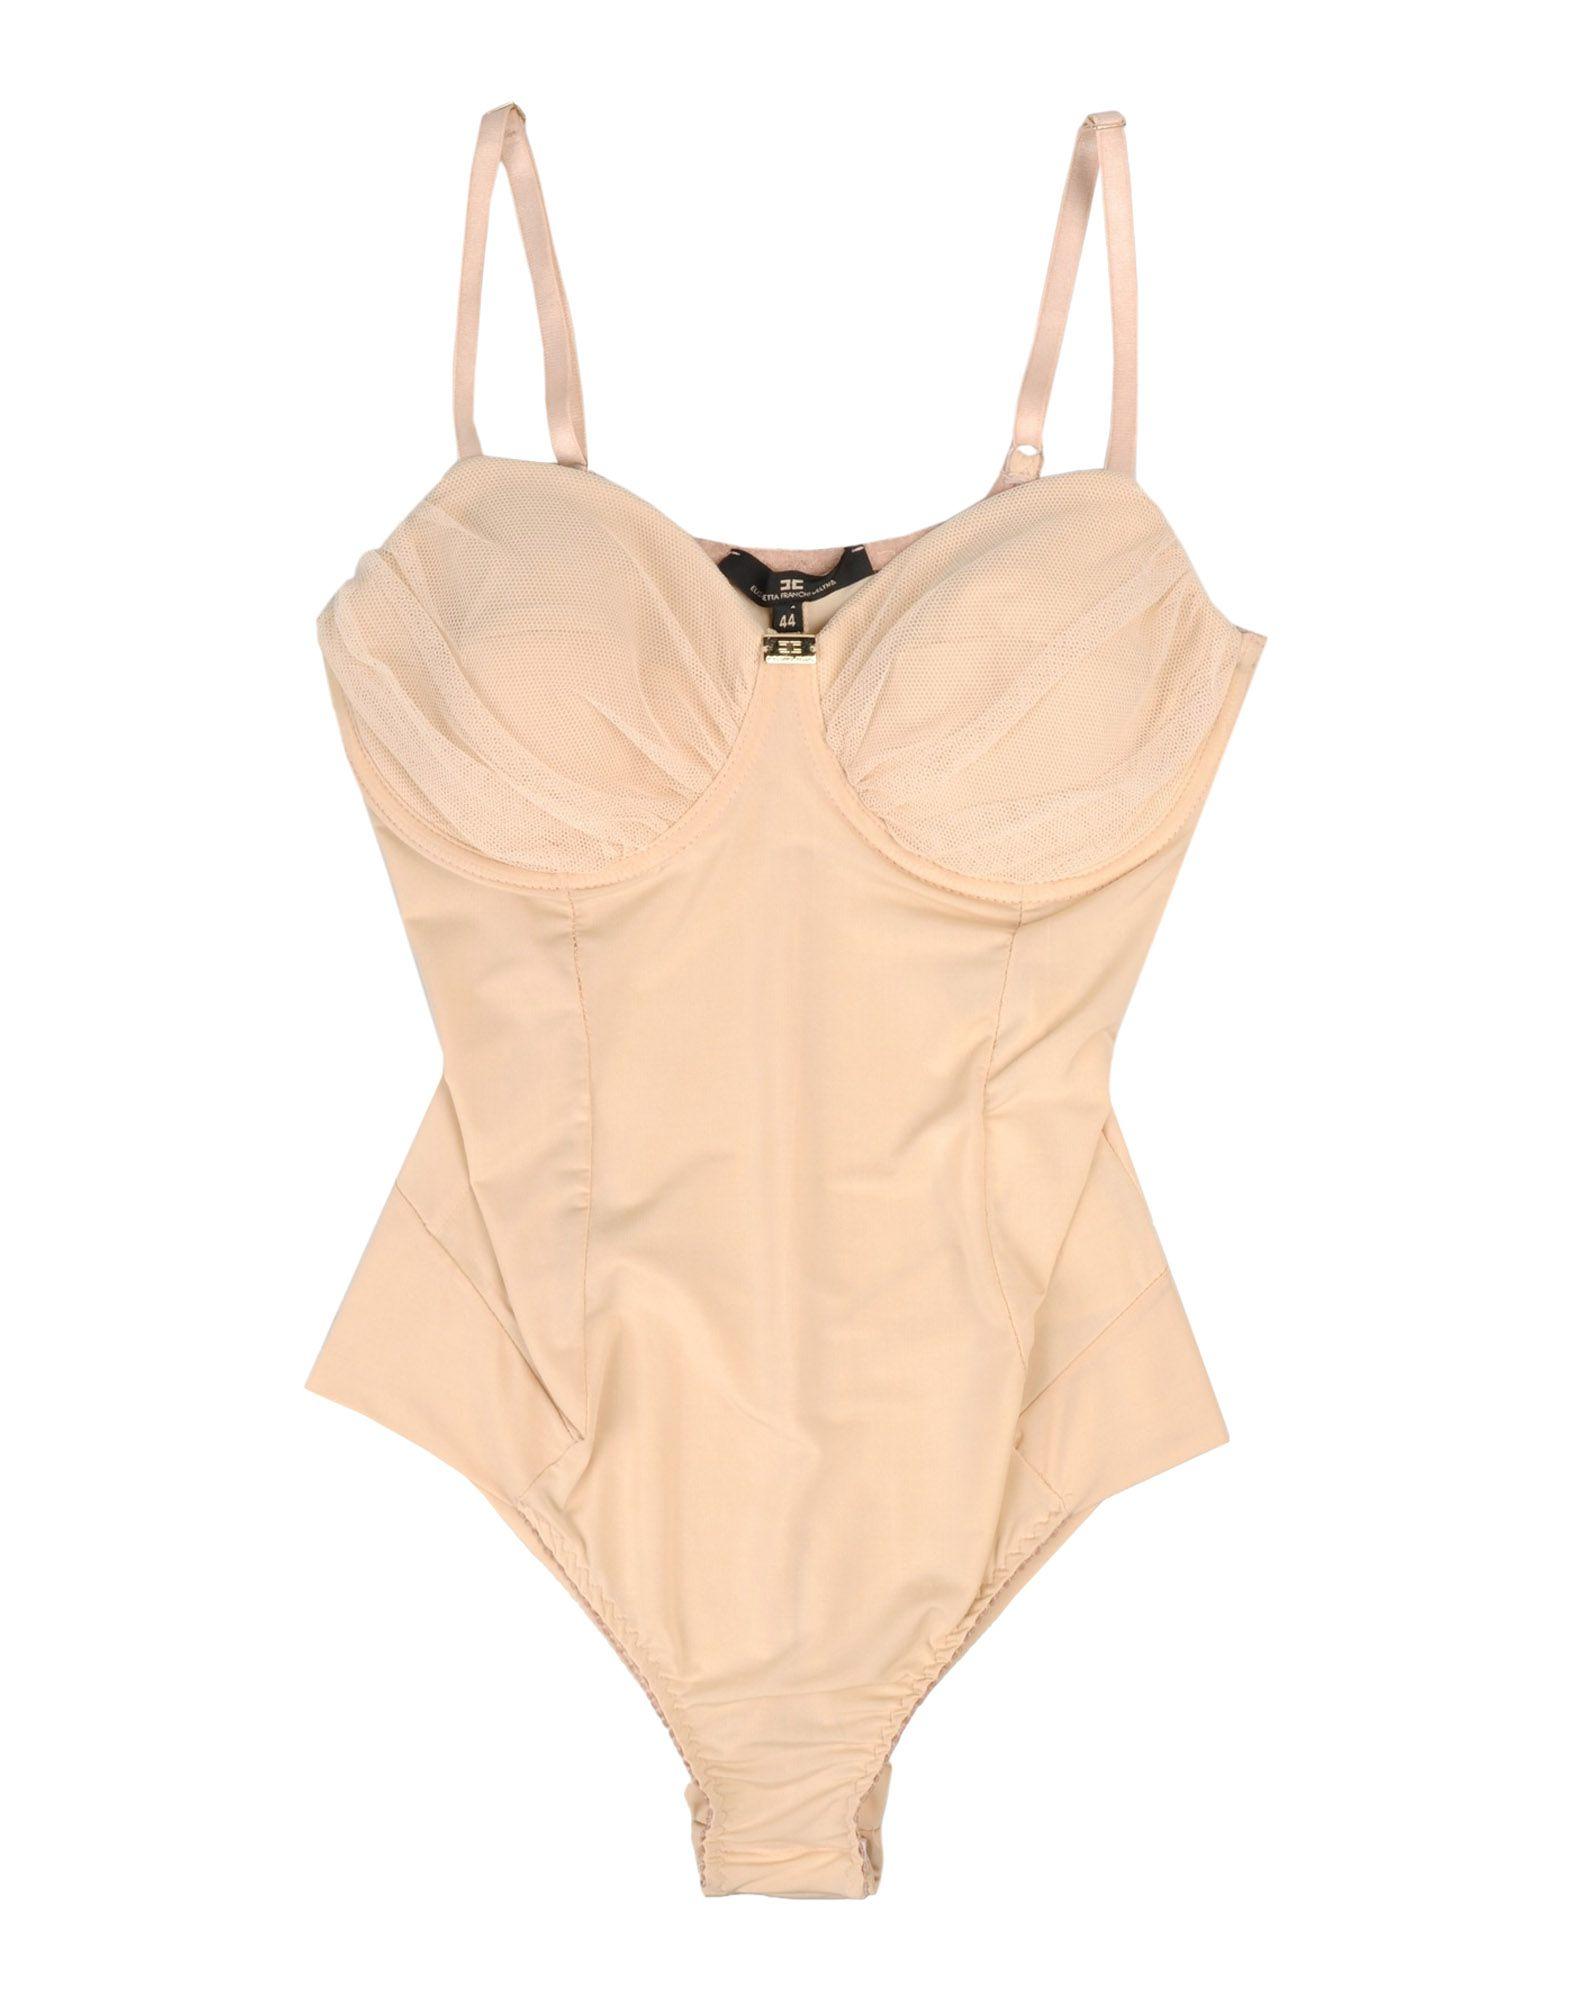 UNDERWEAR - Bodysuits Elisabetta Franchi Outlet 2018 New Explore Cheap Online Get Online Cheap Choice LRZp70neZW